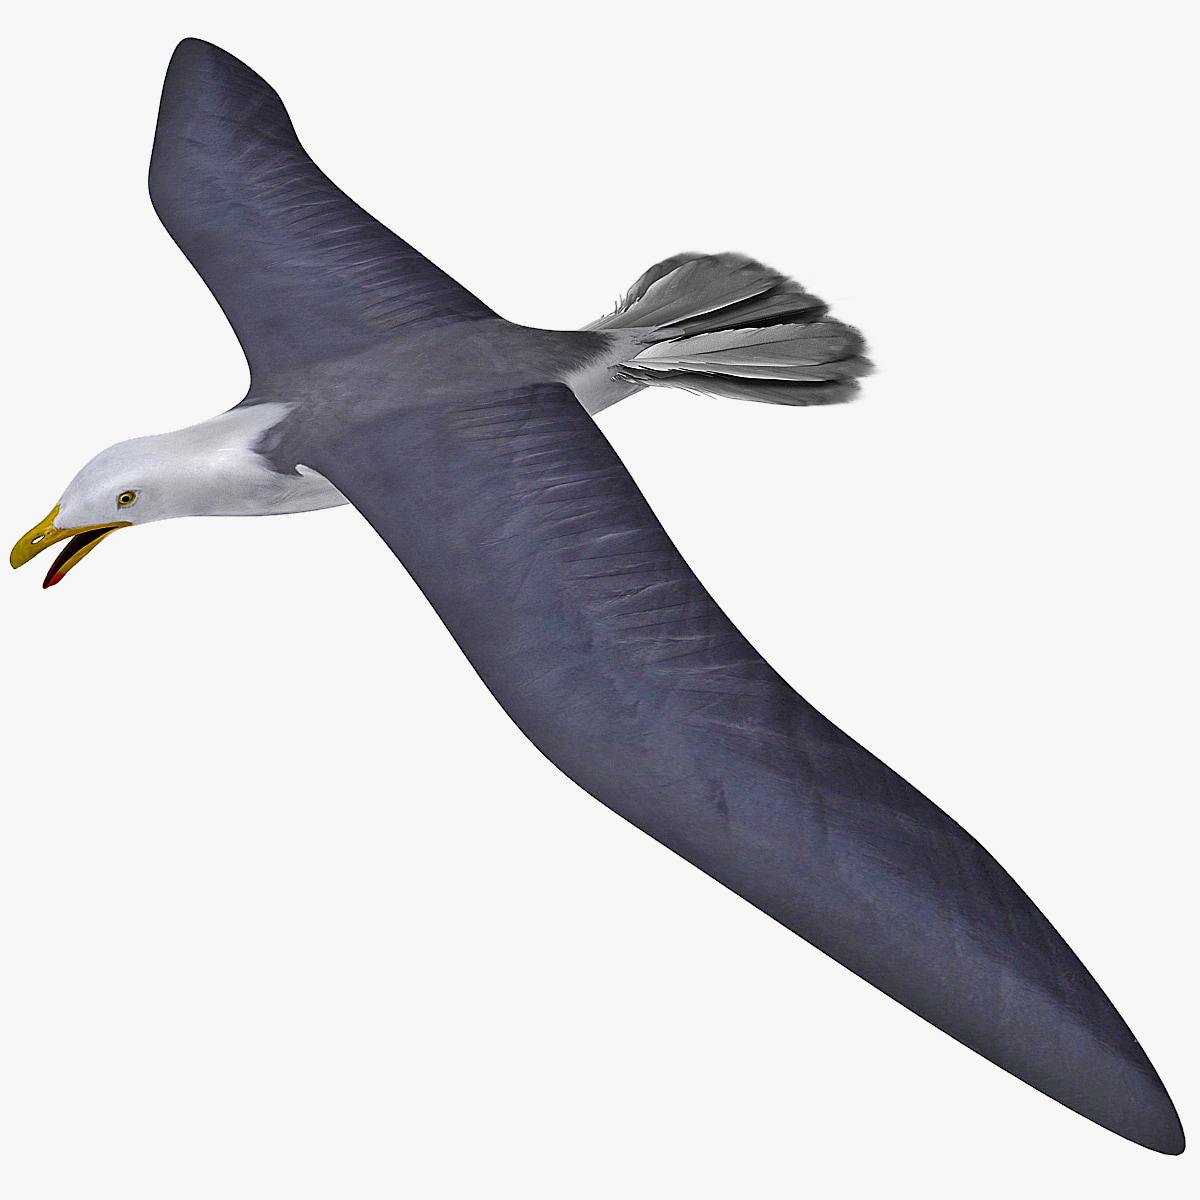 Gull_Flying_Rigged_000.jpg